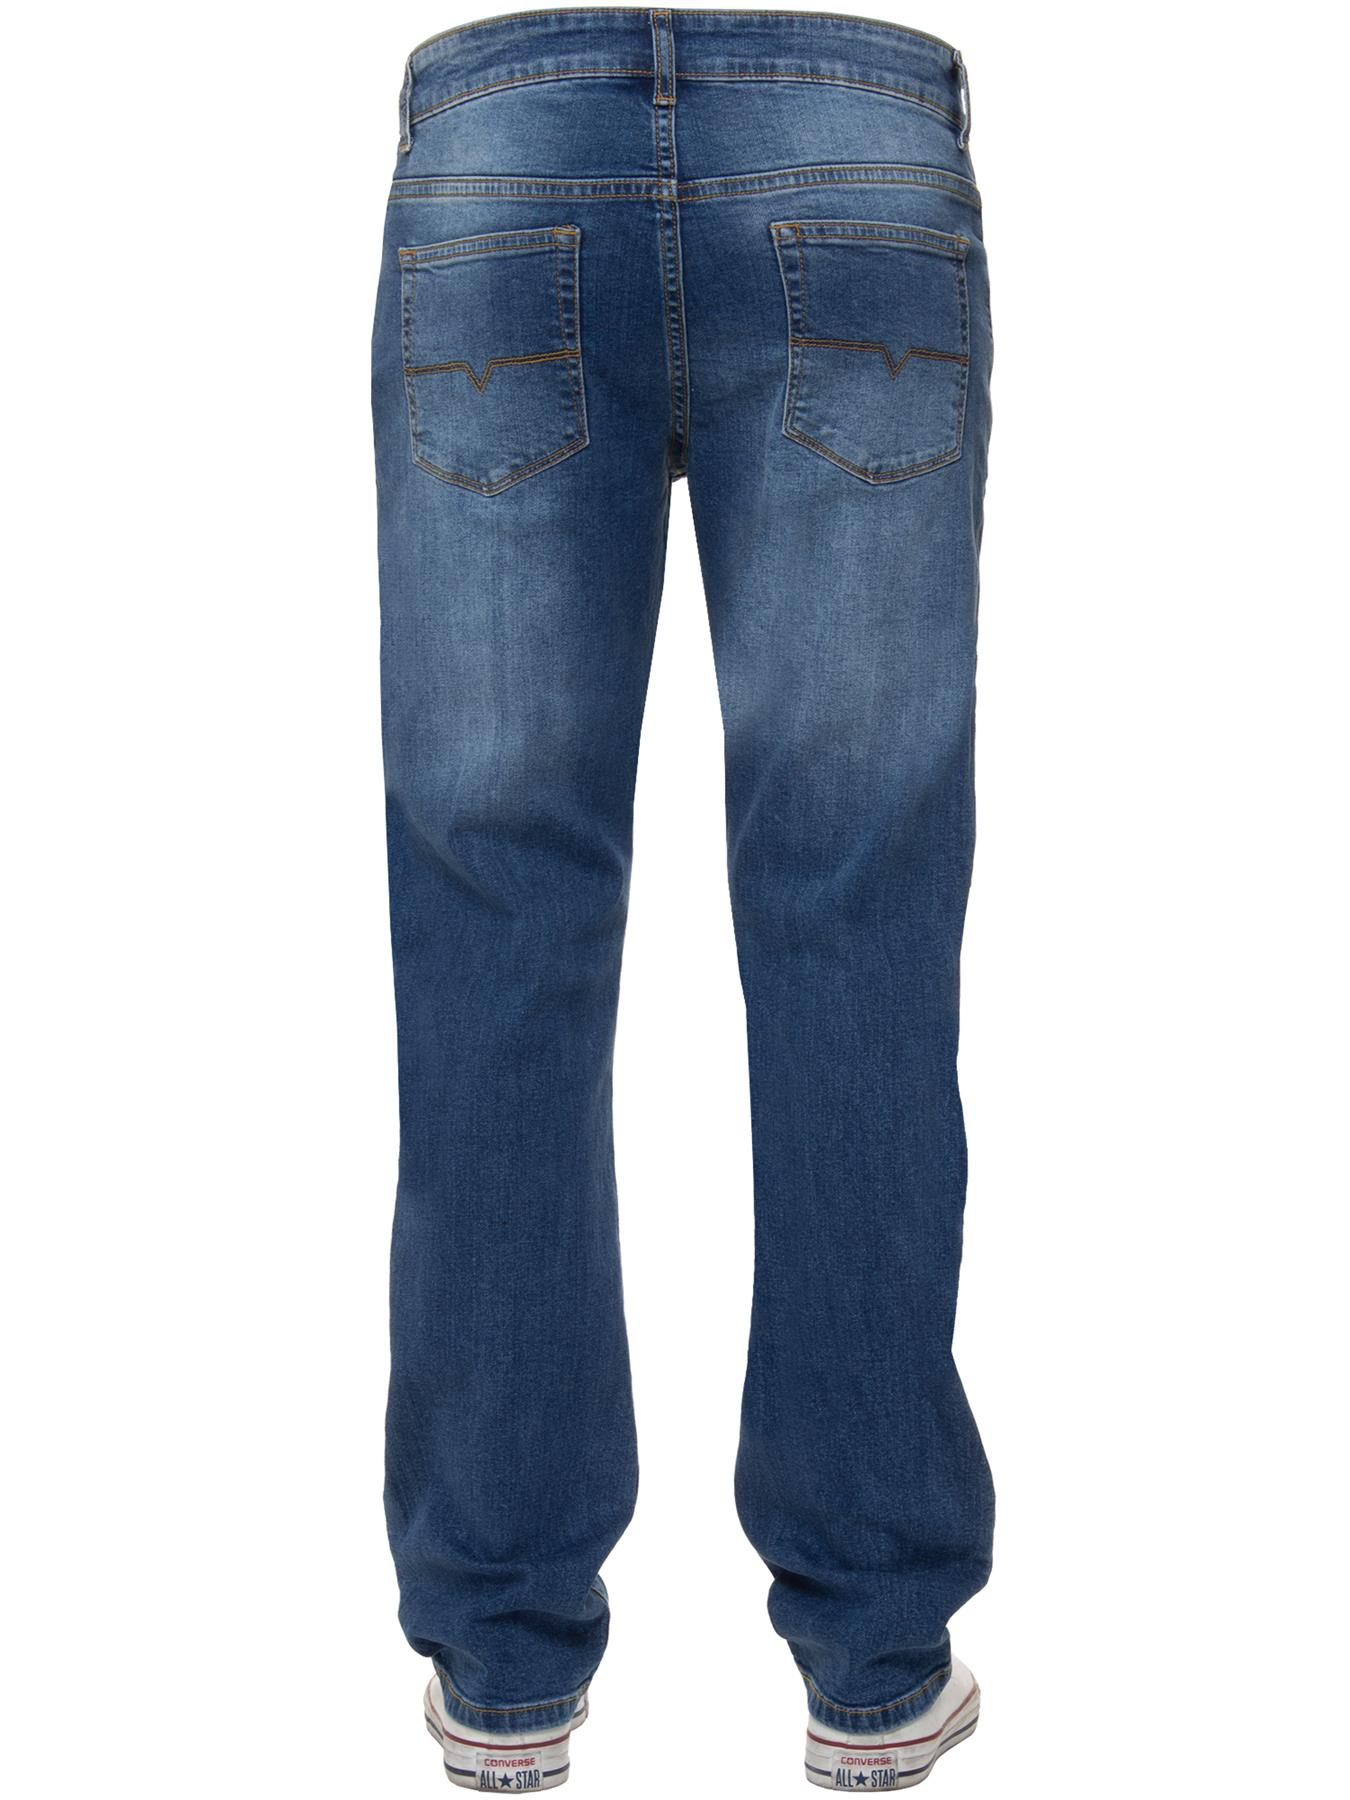 Para-Hombre-Pierna-Recta-Bootcut-Stretch-Denim-Regulares-Pantalon-de-trabajo-Kruze-Todas-Cinturas miniatura 13